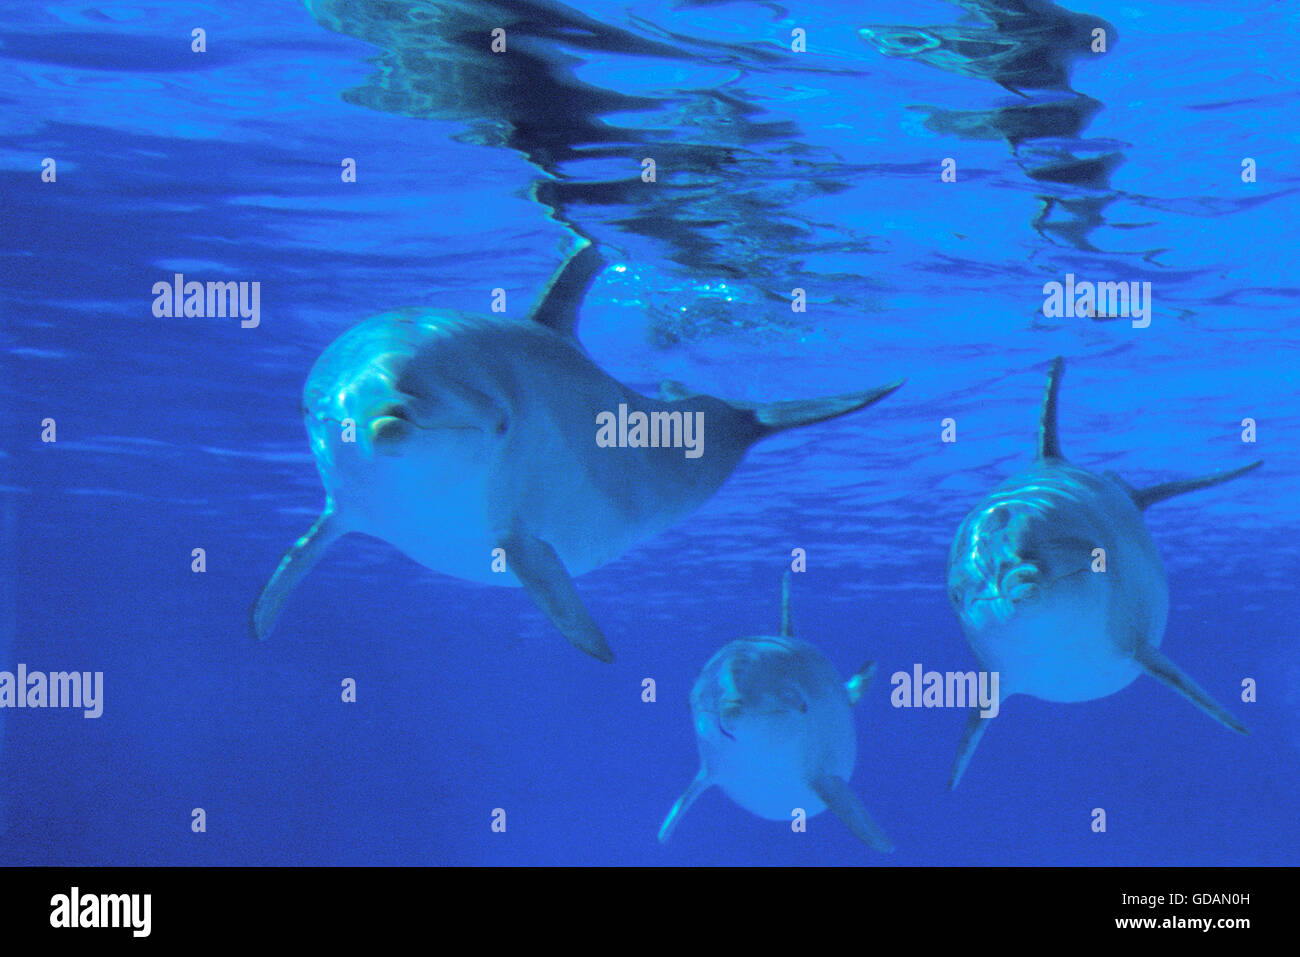 Bottlenose Dolphin, tursiops truncatus, Group, Underwater View Stock Photo